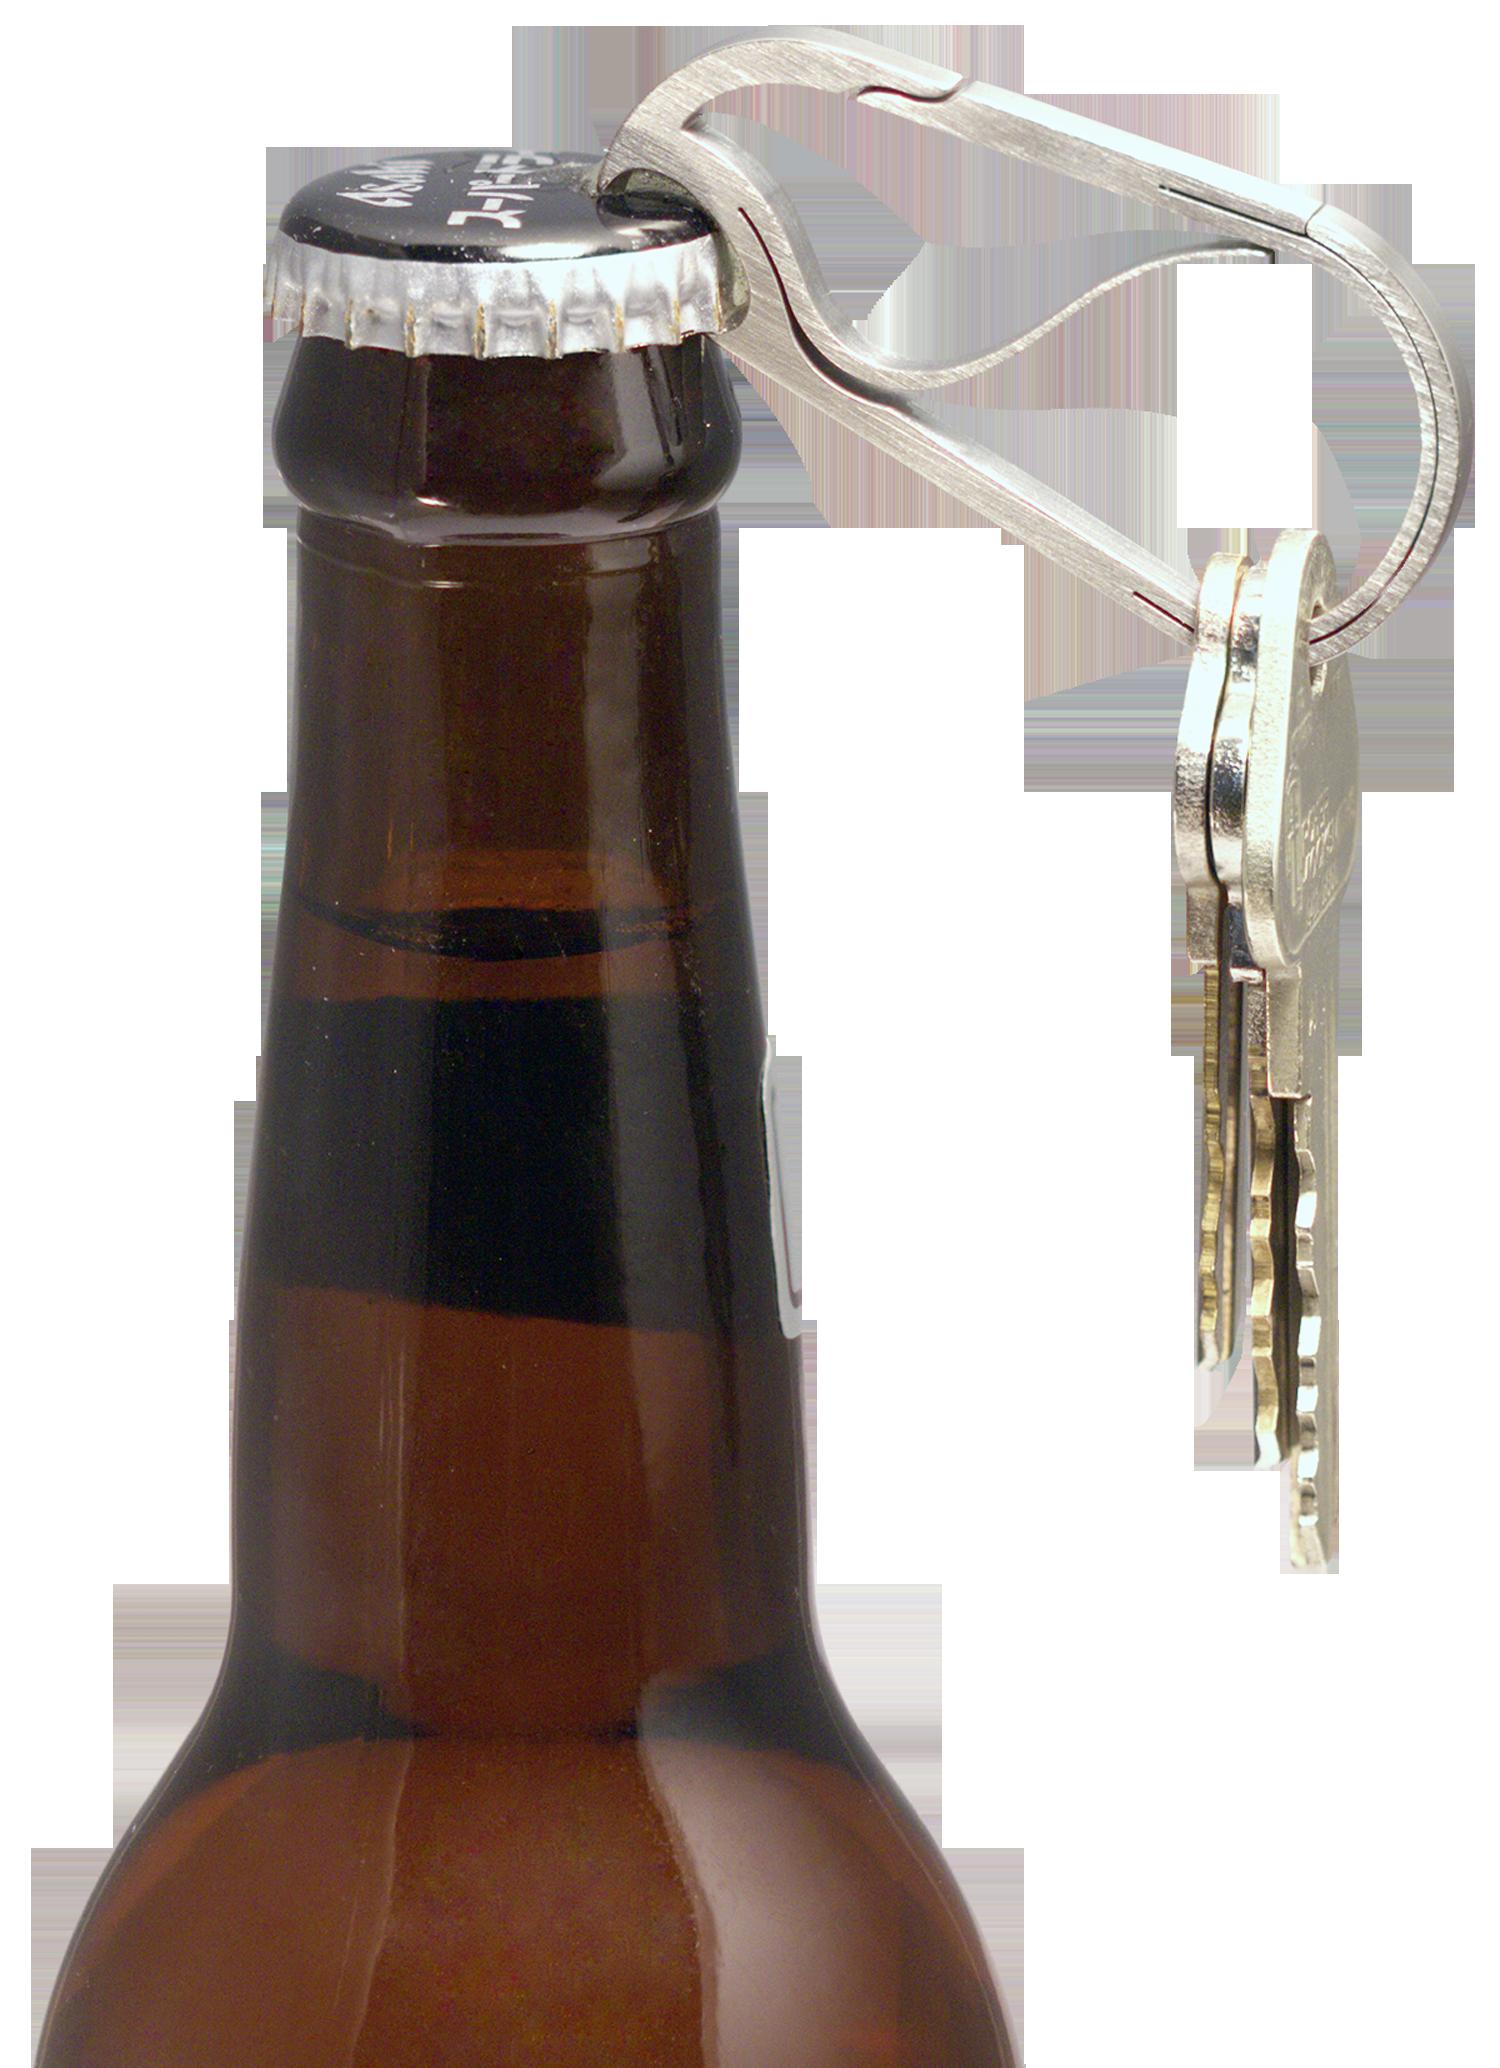 Bico KeyKlipz Bottle Opener Carabiner - Titanium